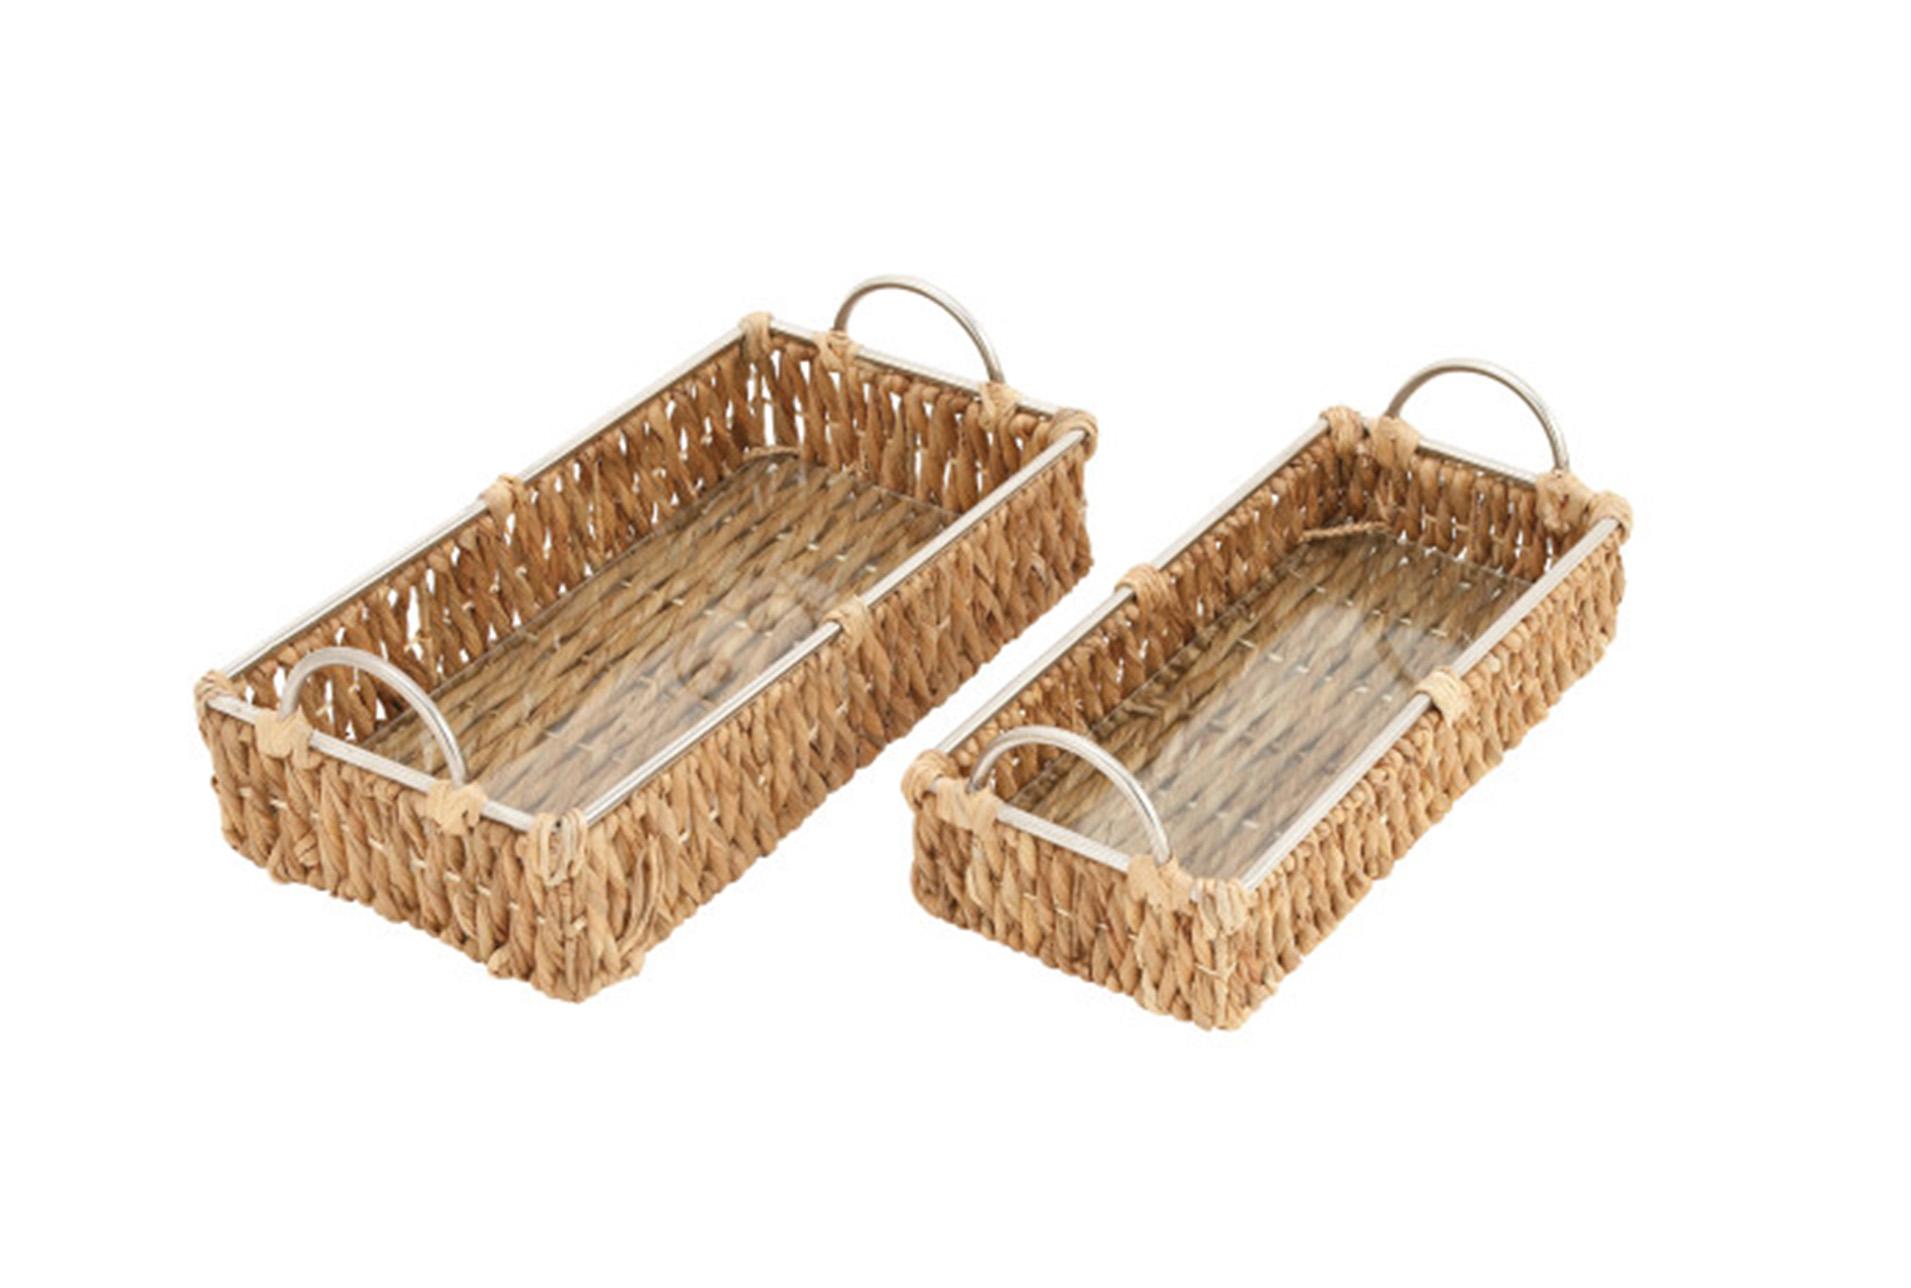 Incroyable 2 Piece Set Wicker U0026 Metal Long Baskets   360